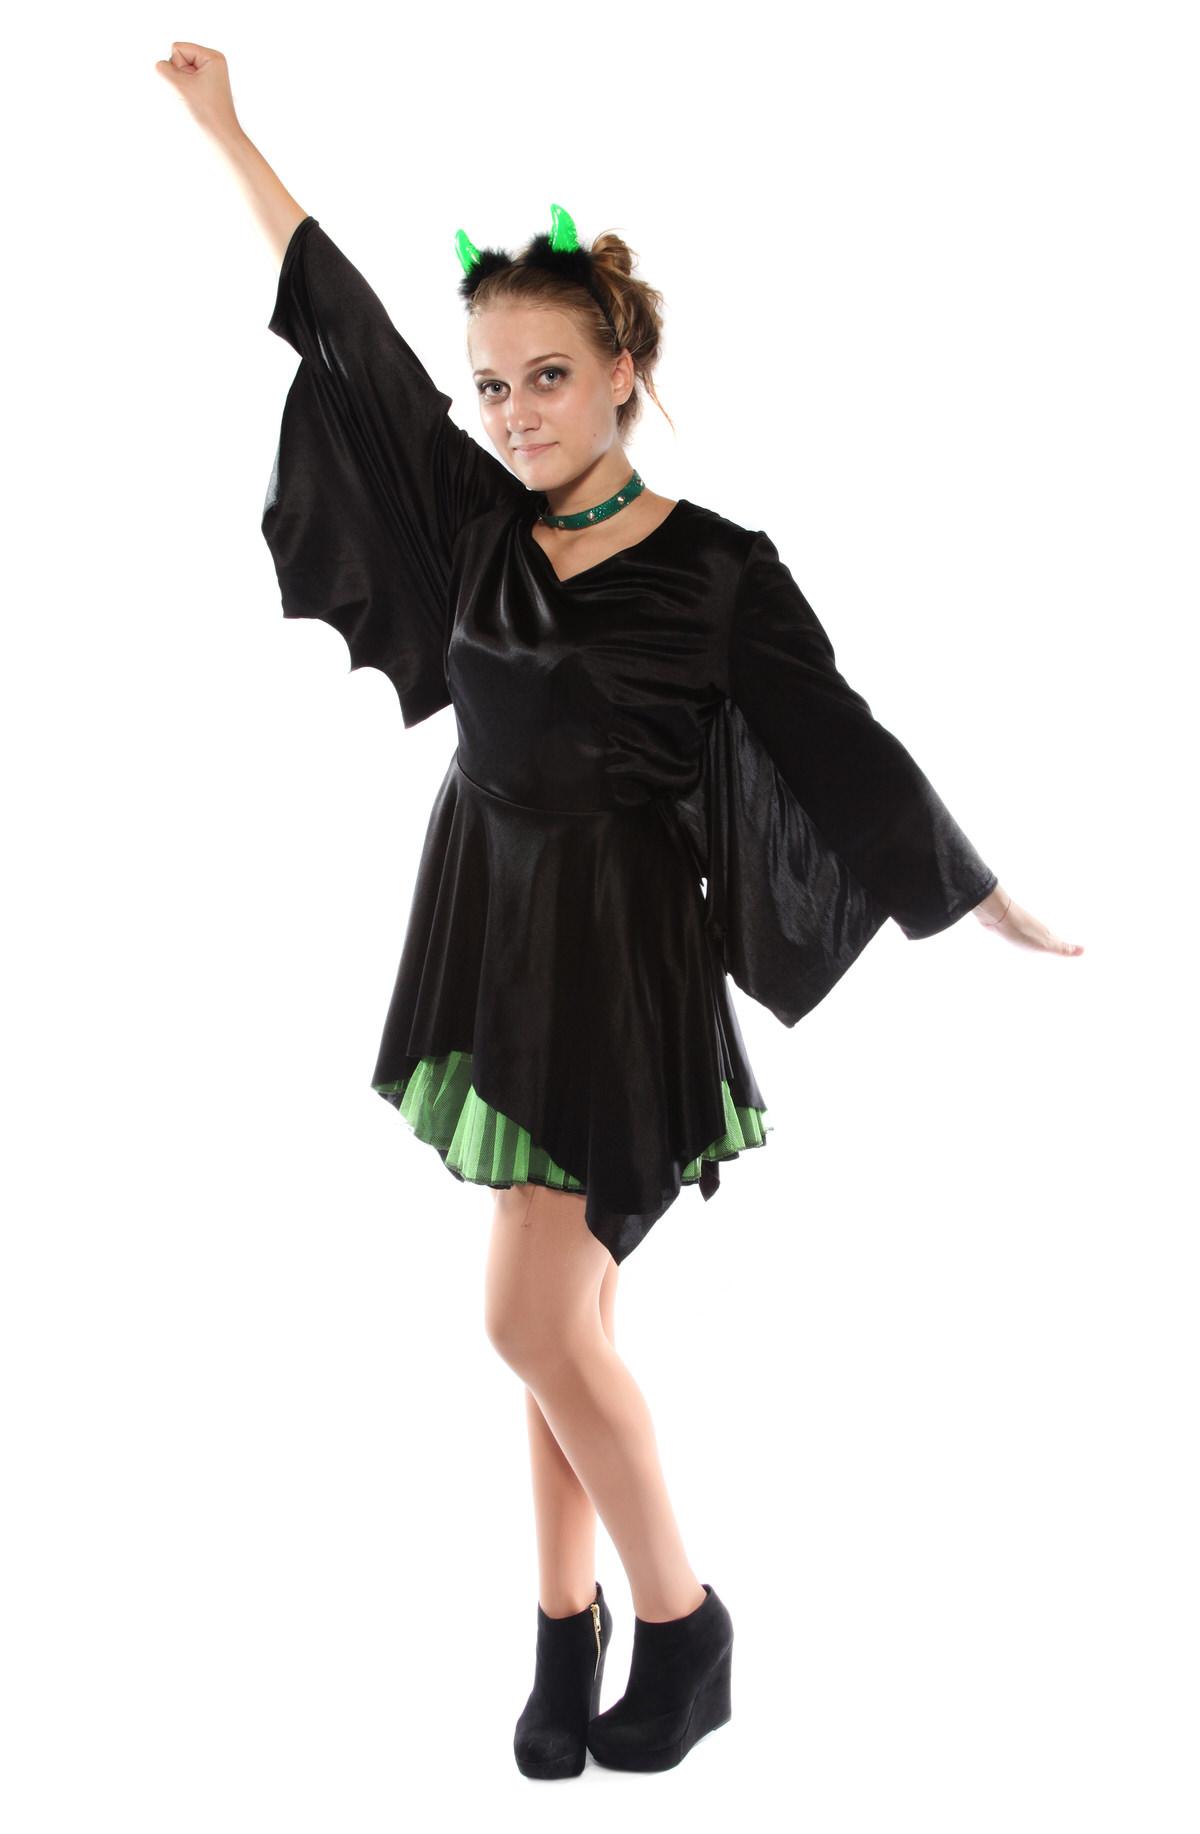 PUNKY GREEN AND BLACK BAT DRESS COSTUME